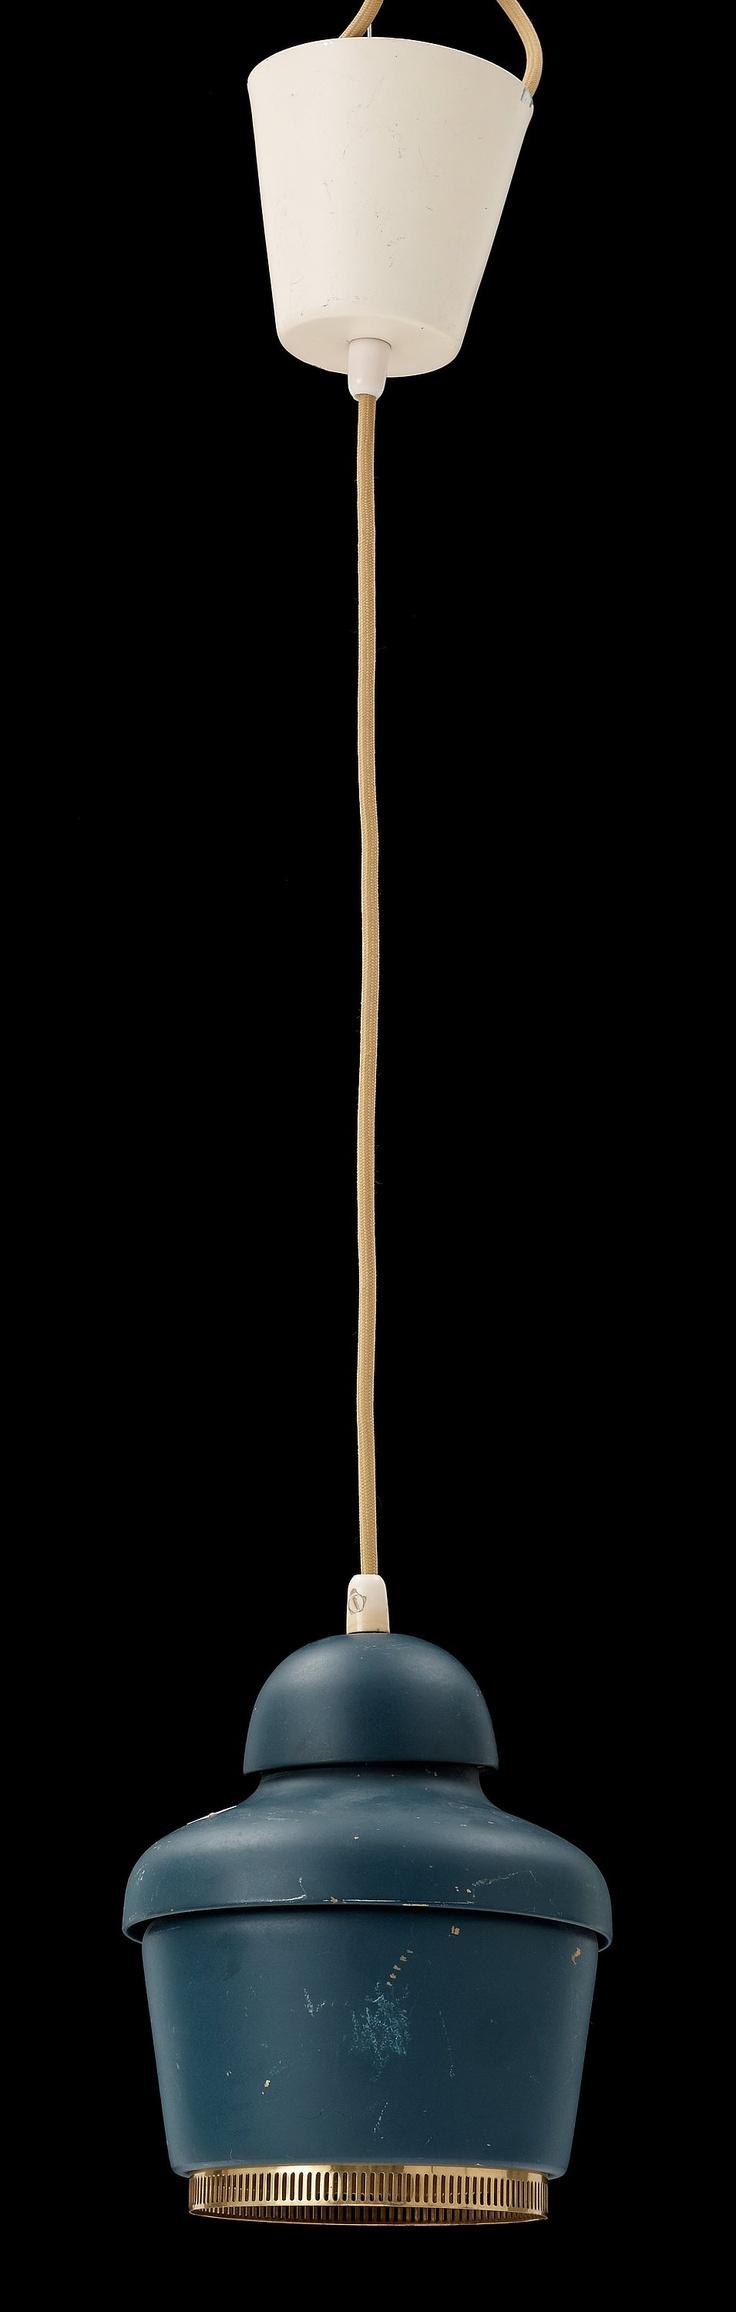 Alvar Aalto, A 330 Pendant Lamp (http://www.replicalights.com.au/replica-arteck-a330-bell-black-pendant-light/)